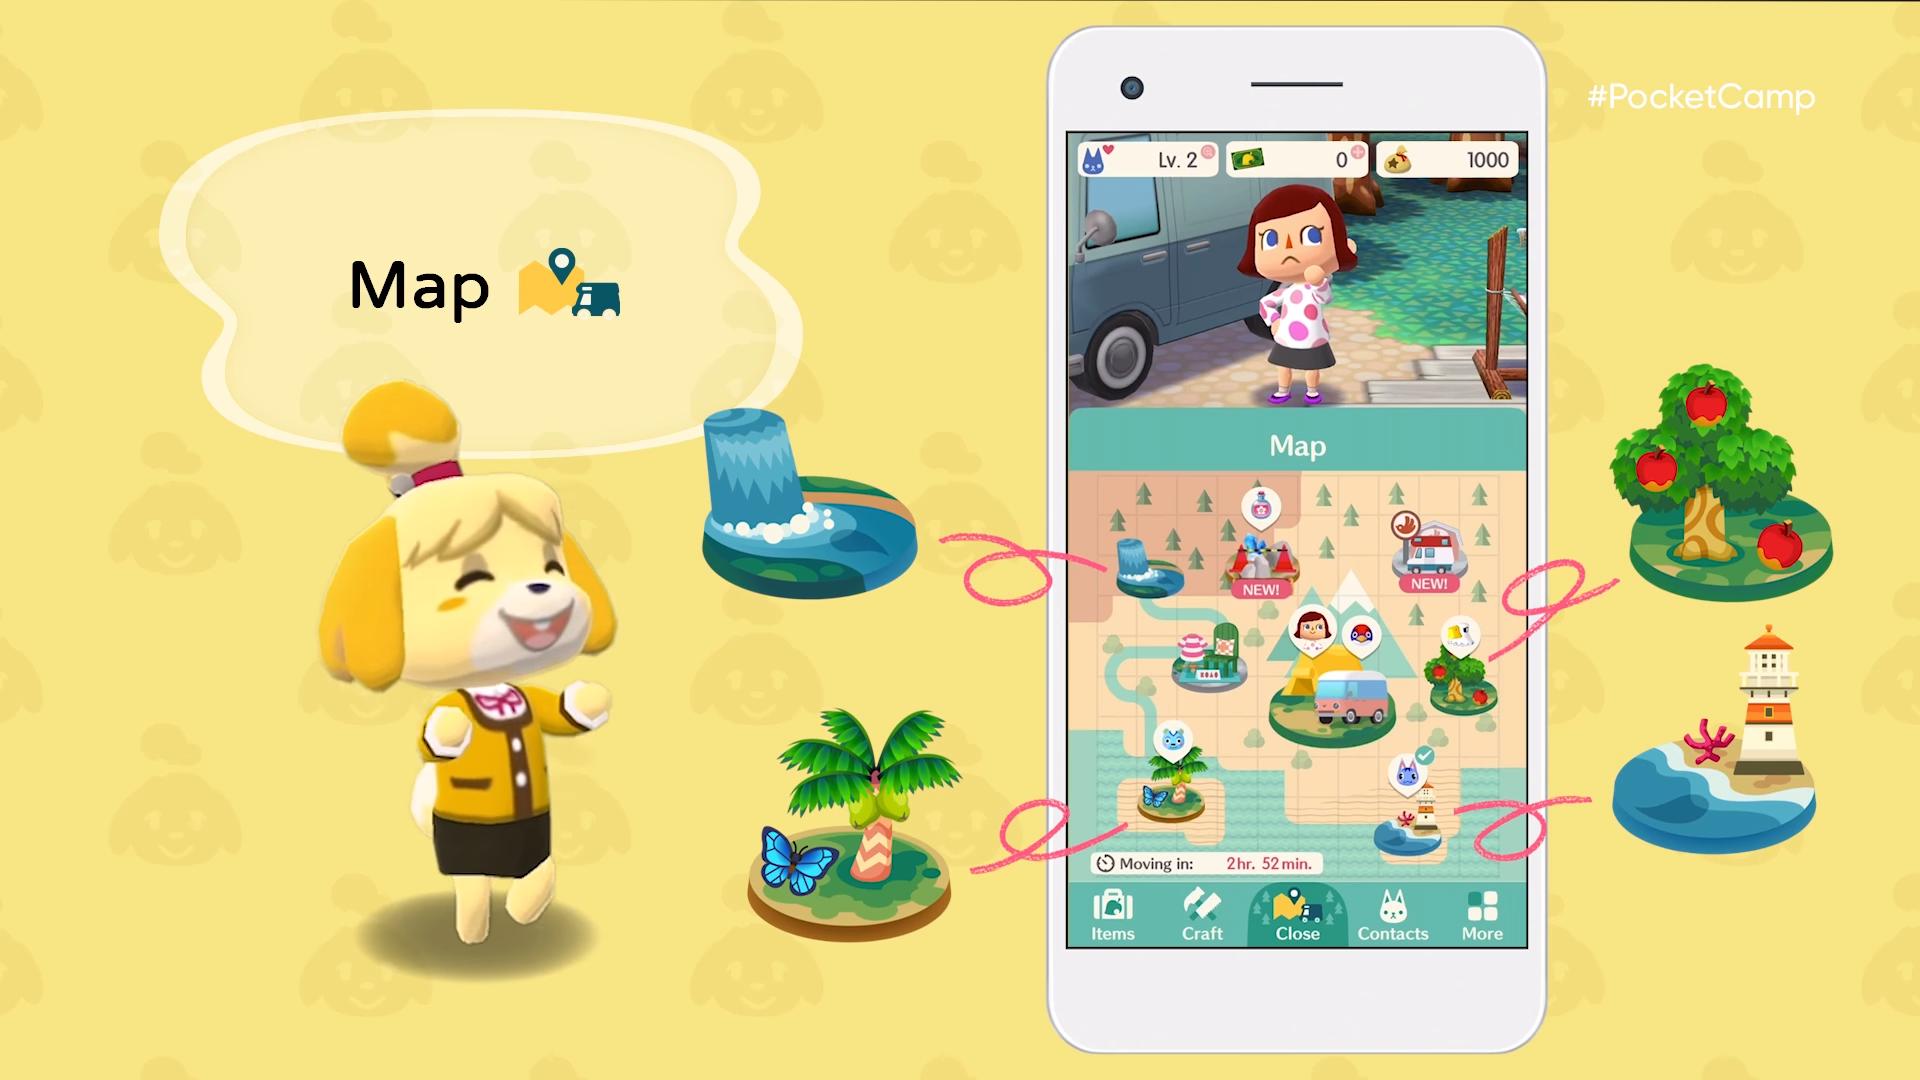 Image: Nintendo UK